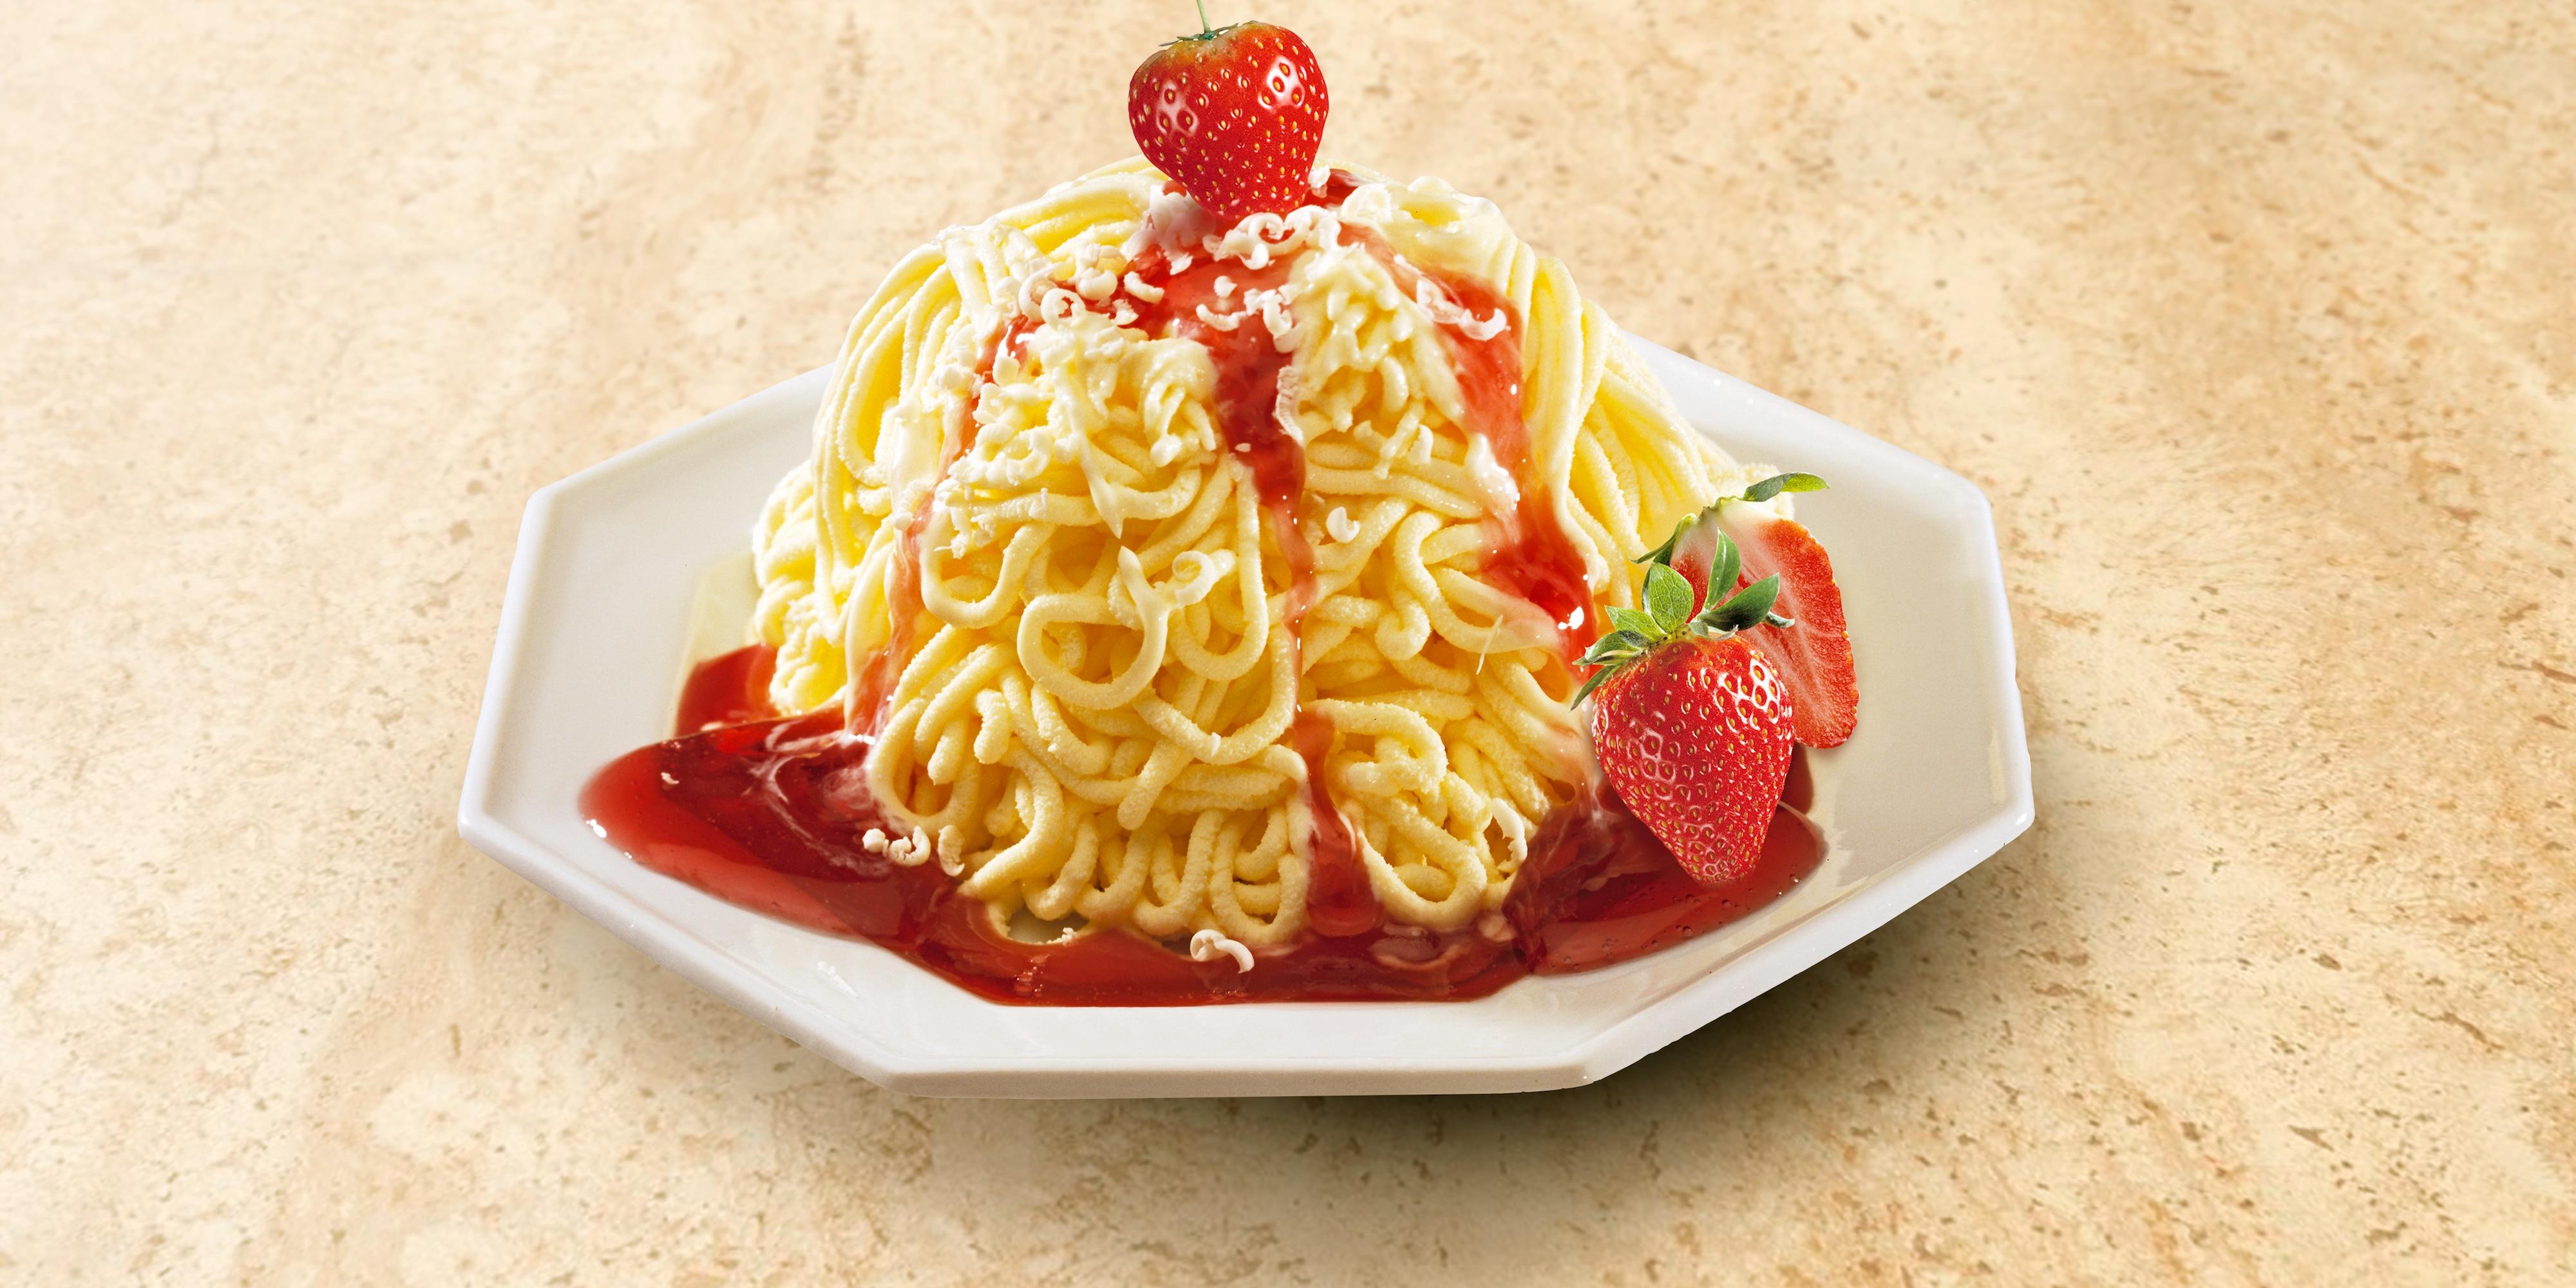 'Spaghetti' ice cream dessert